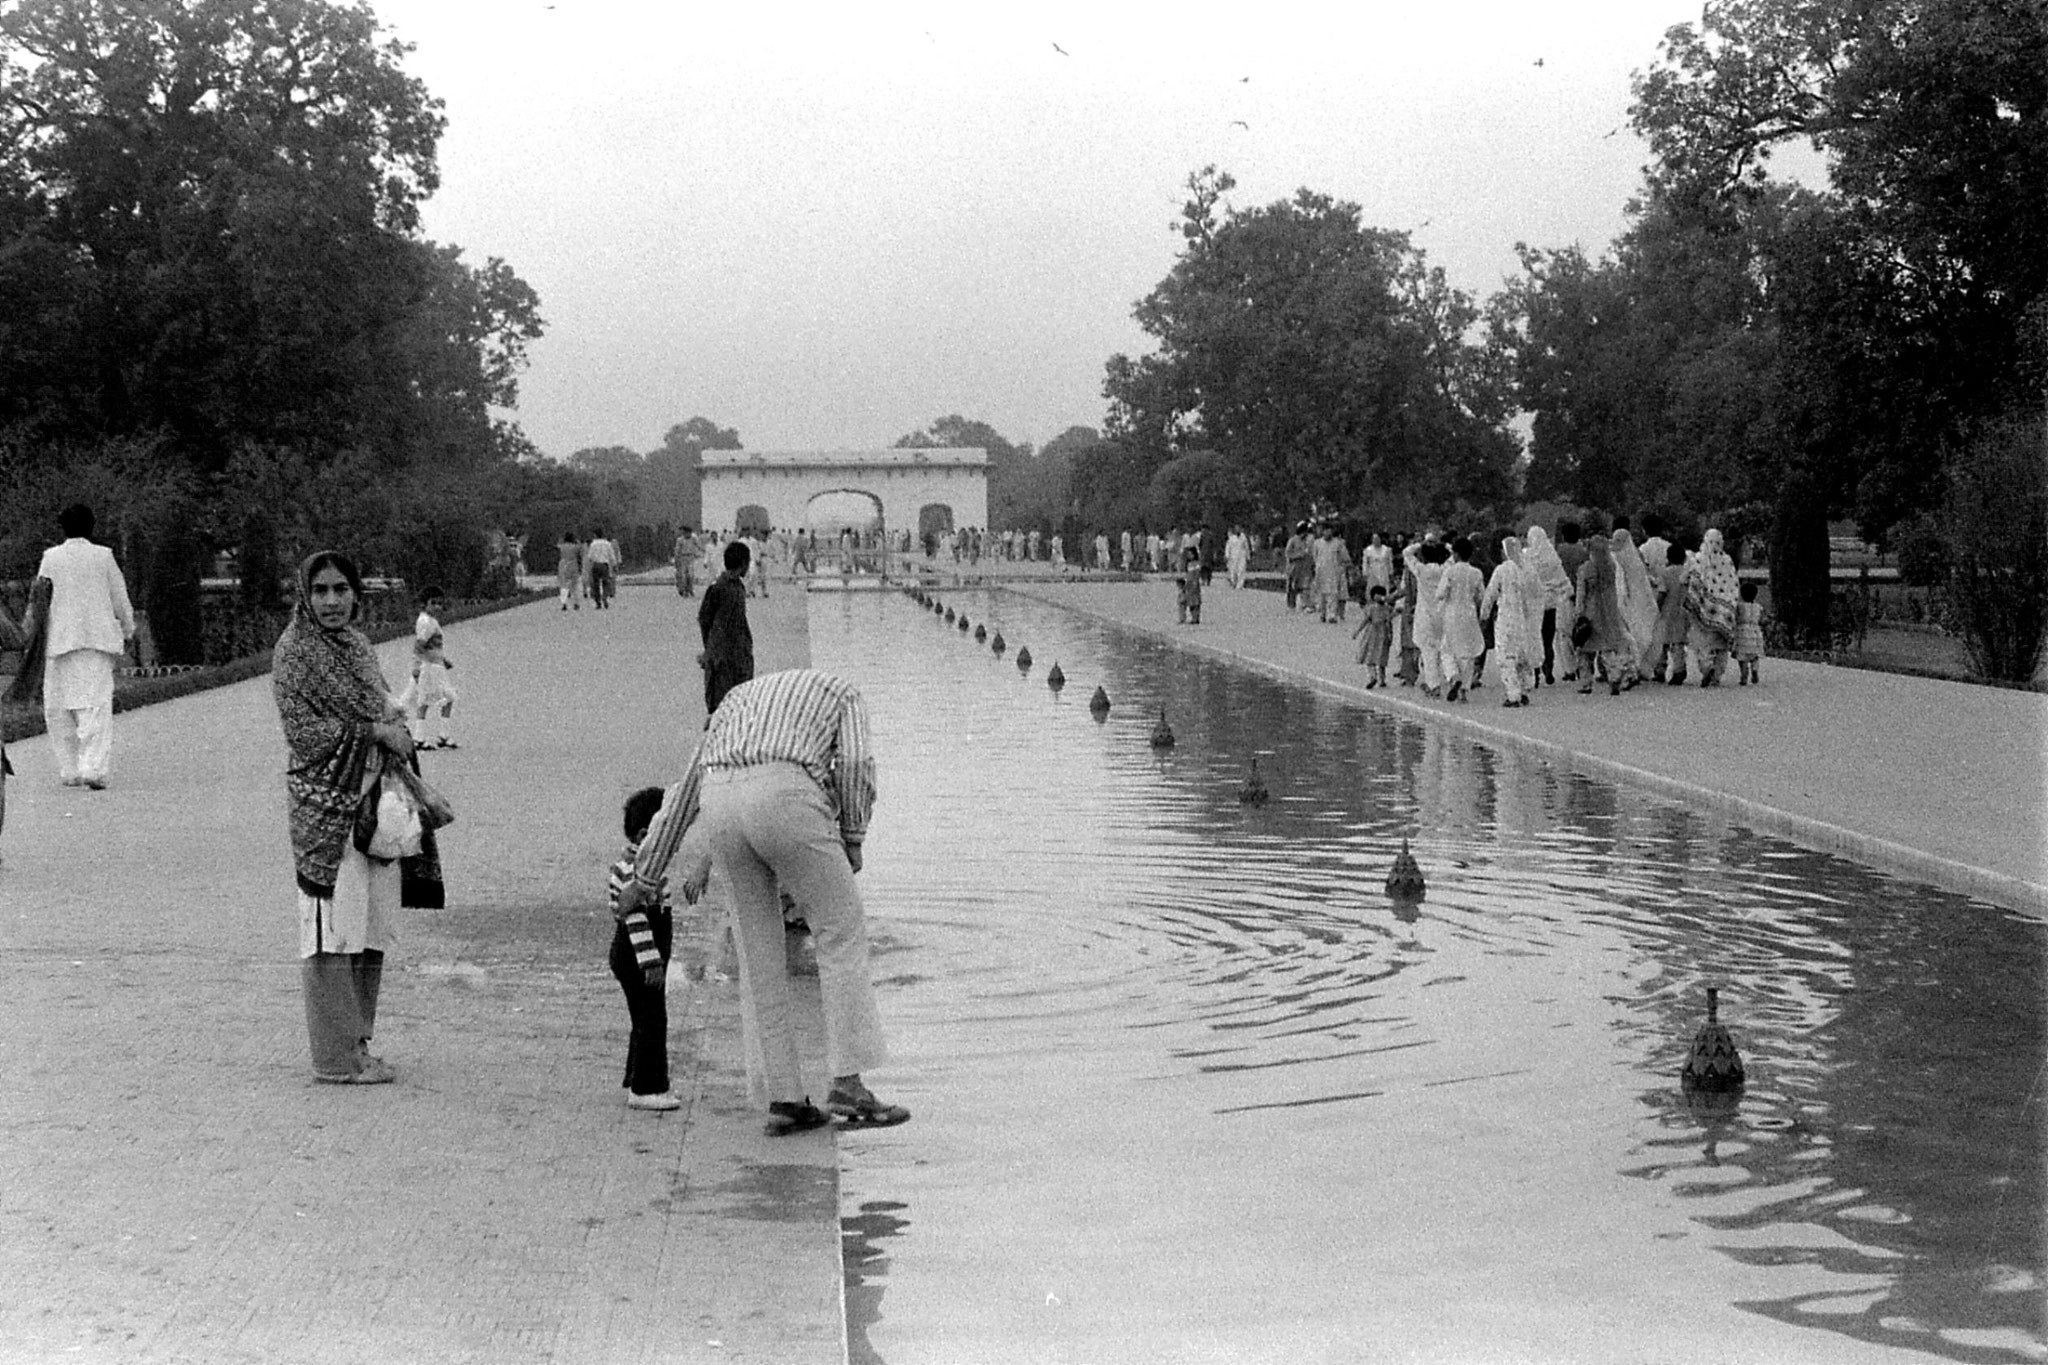 10/11/1989: 1: Lahore, Shalimar garden